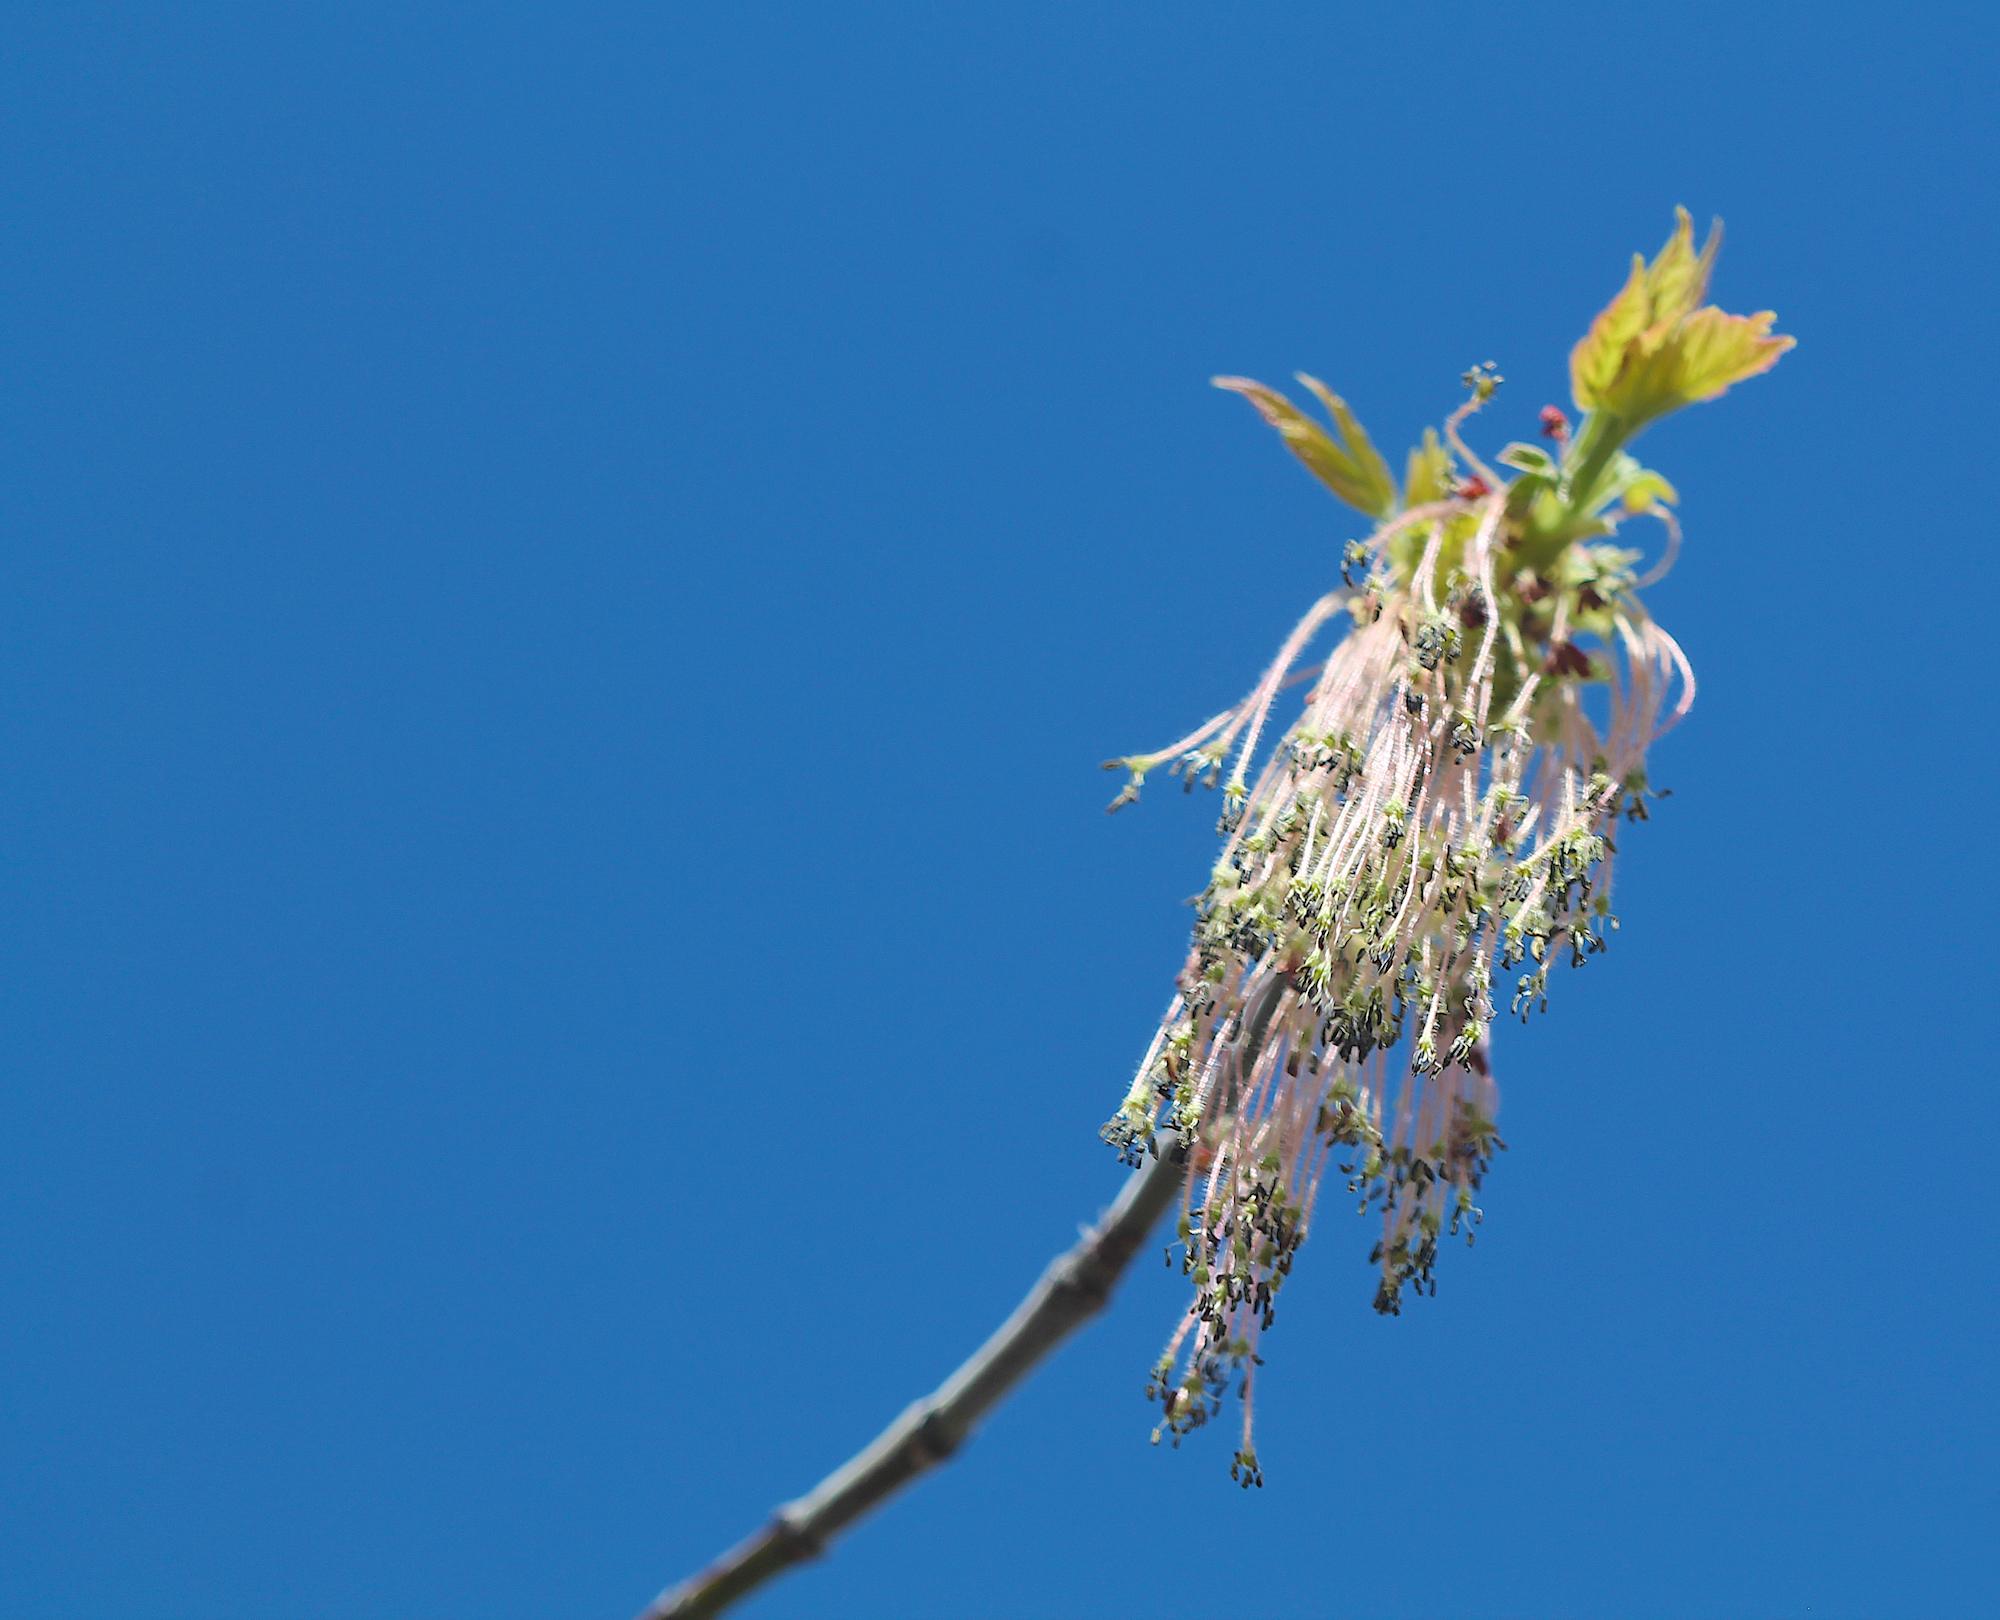 Image - box elder flowers4.JPG